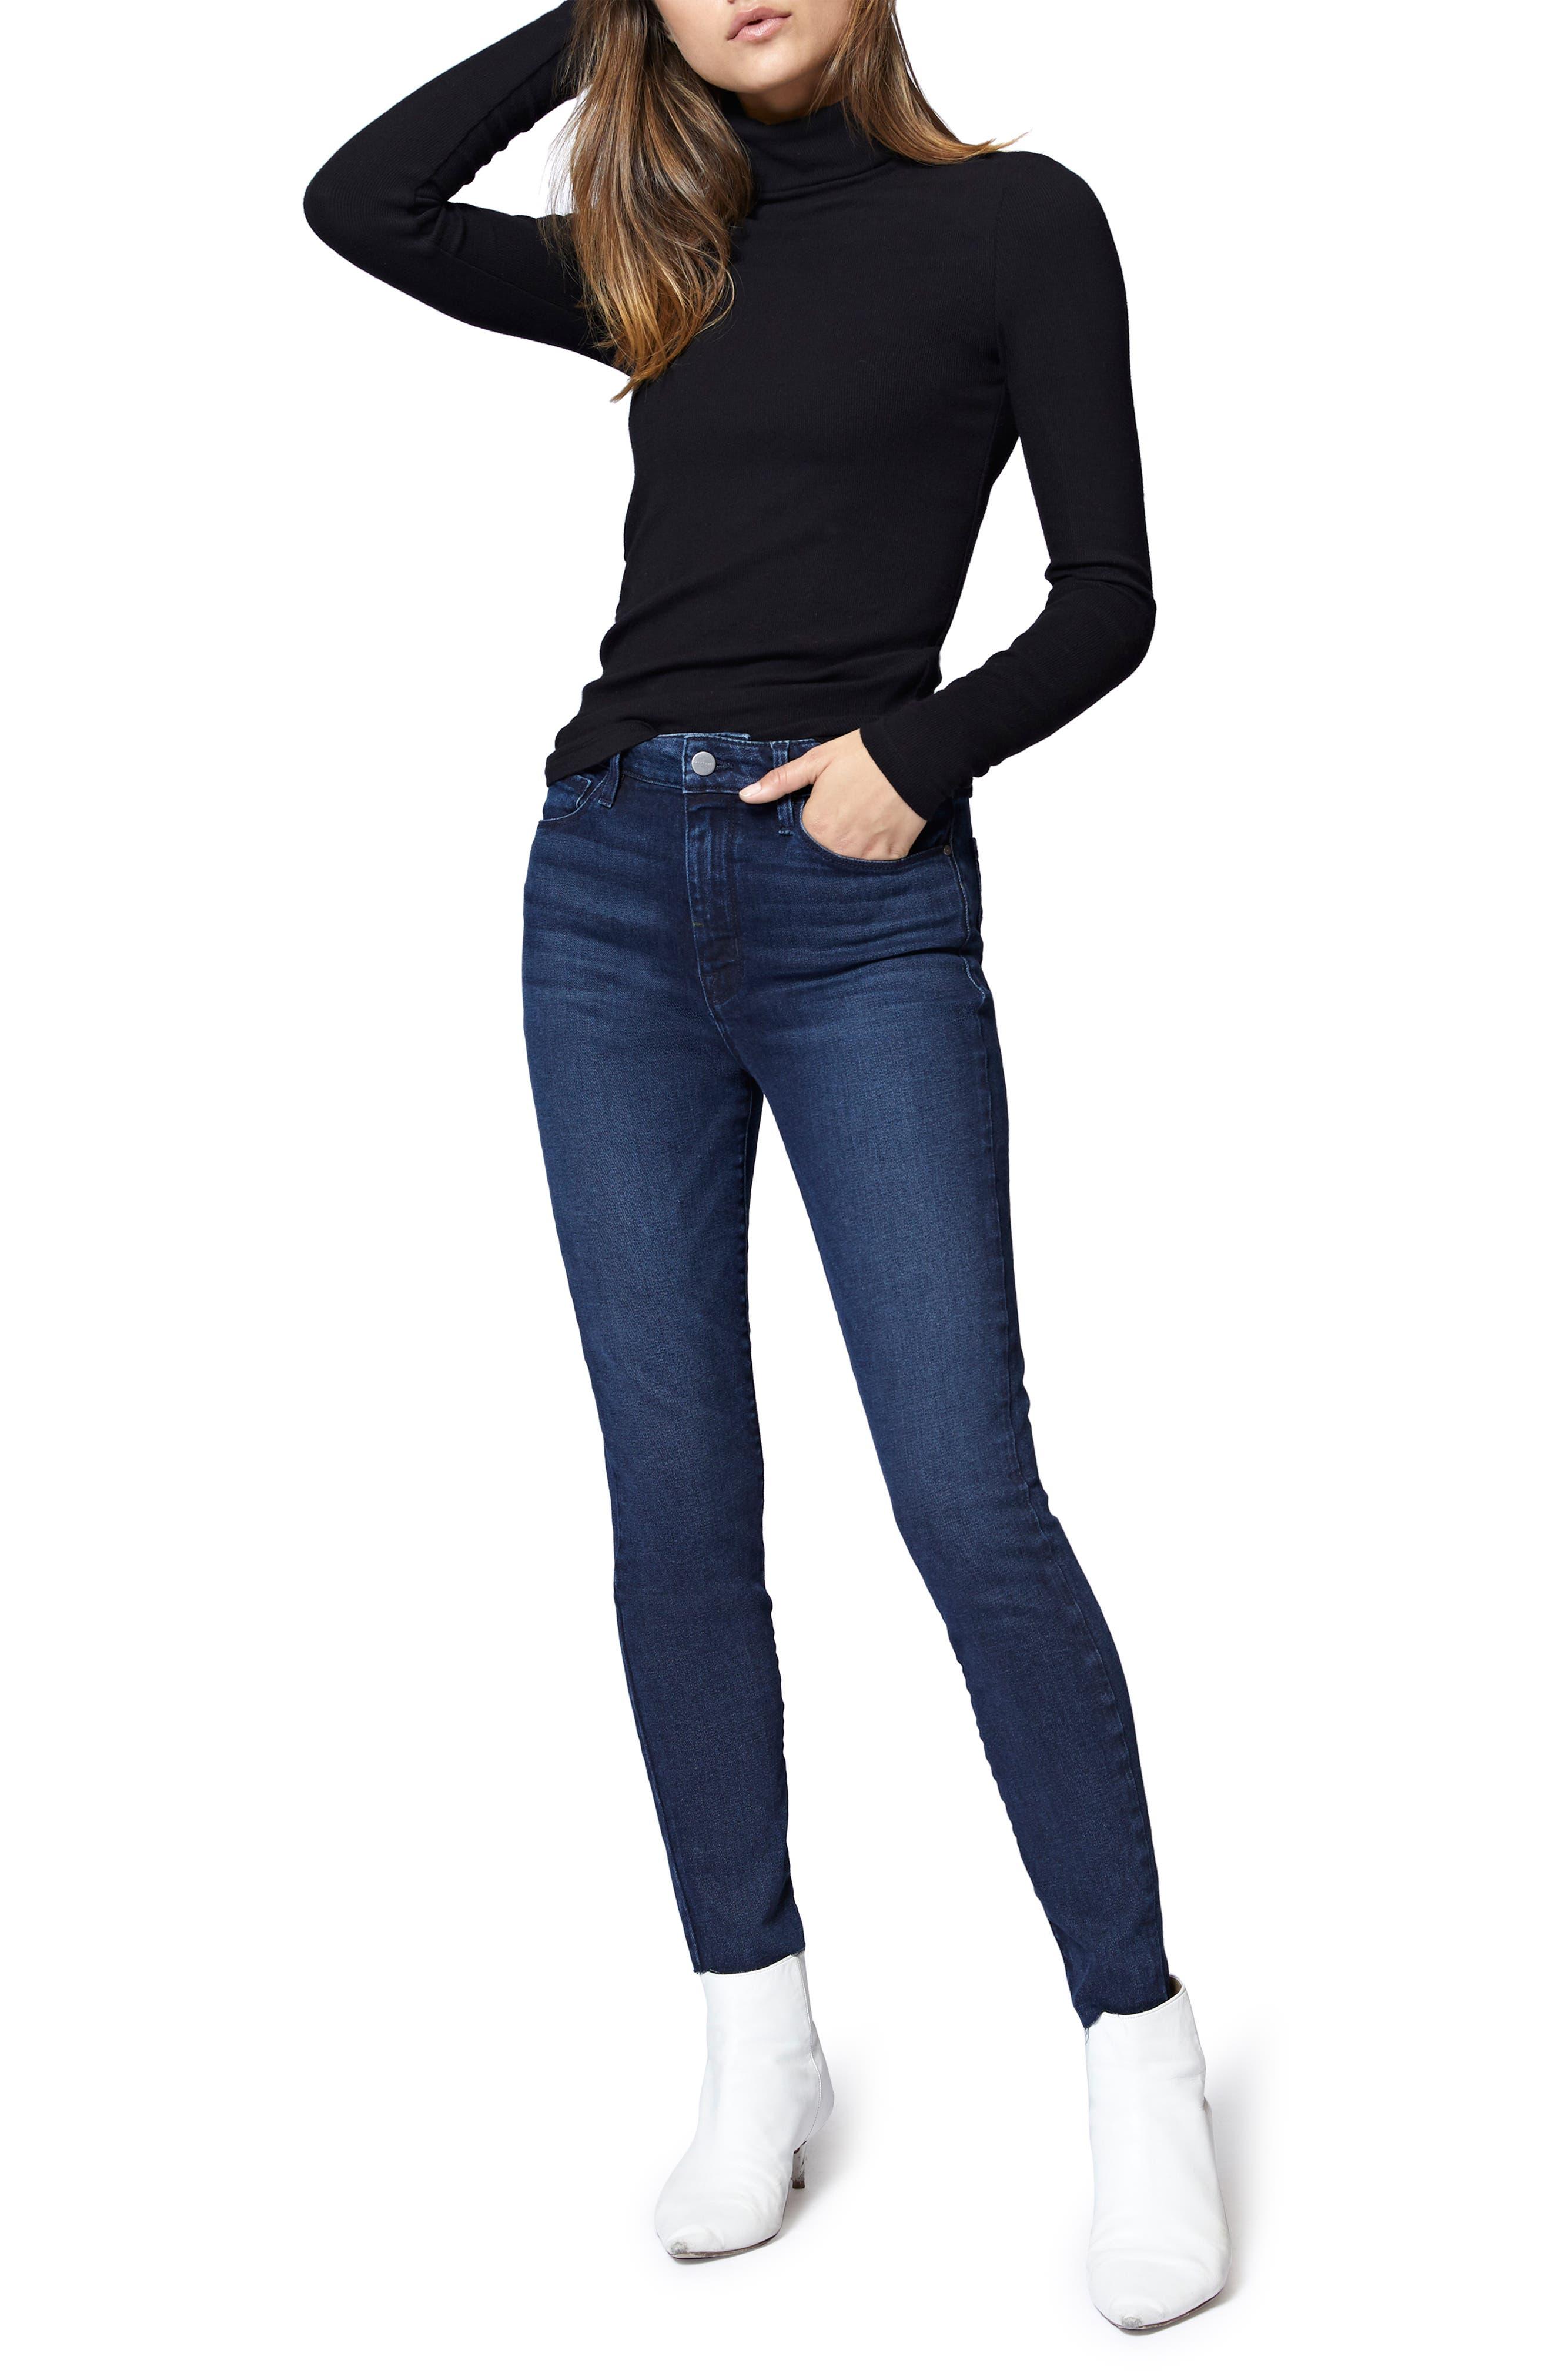 SANCTUARY,                             Social High Rise Raw Hem Skinny Ankle Jeans,                             Alternate thumbnail 7, color,                             401